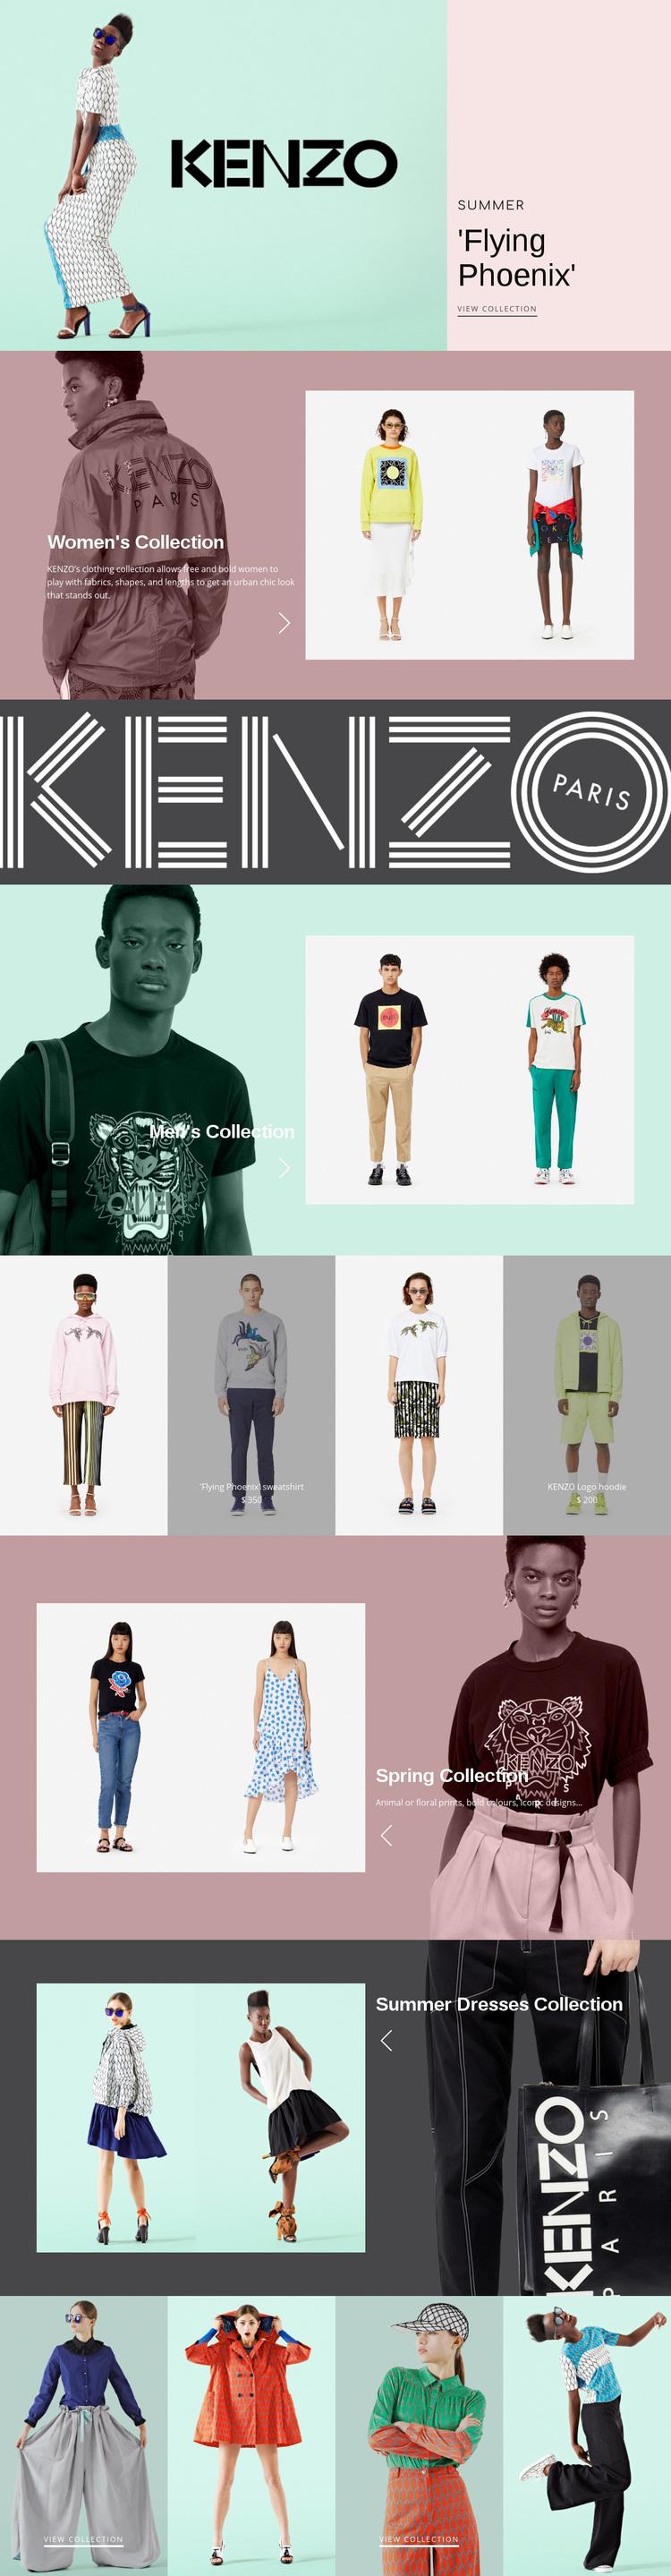 Atelier of modern fashion Web Page Designer